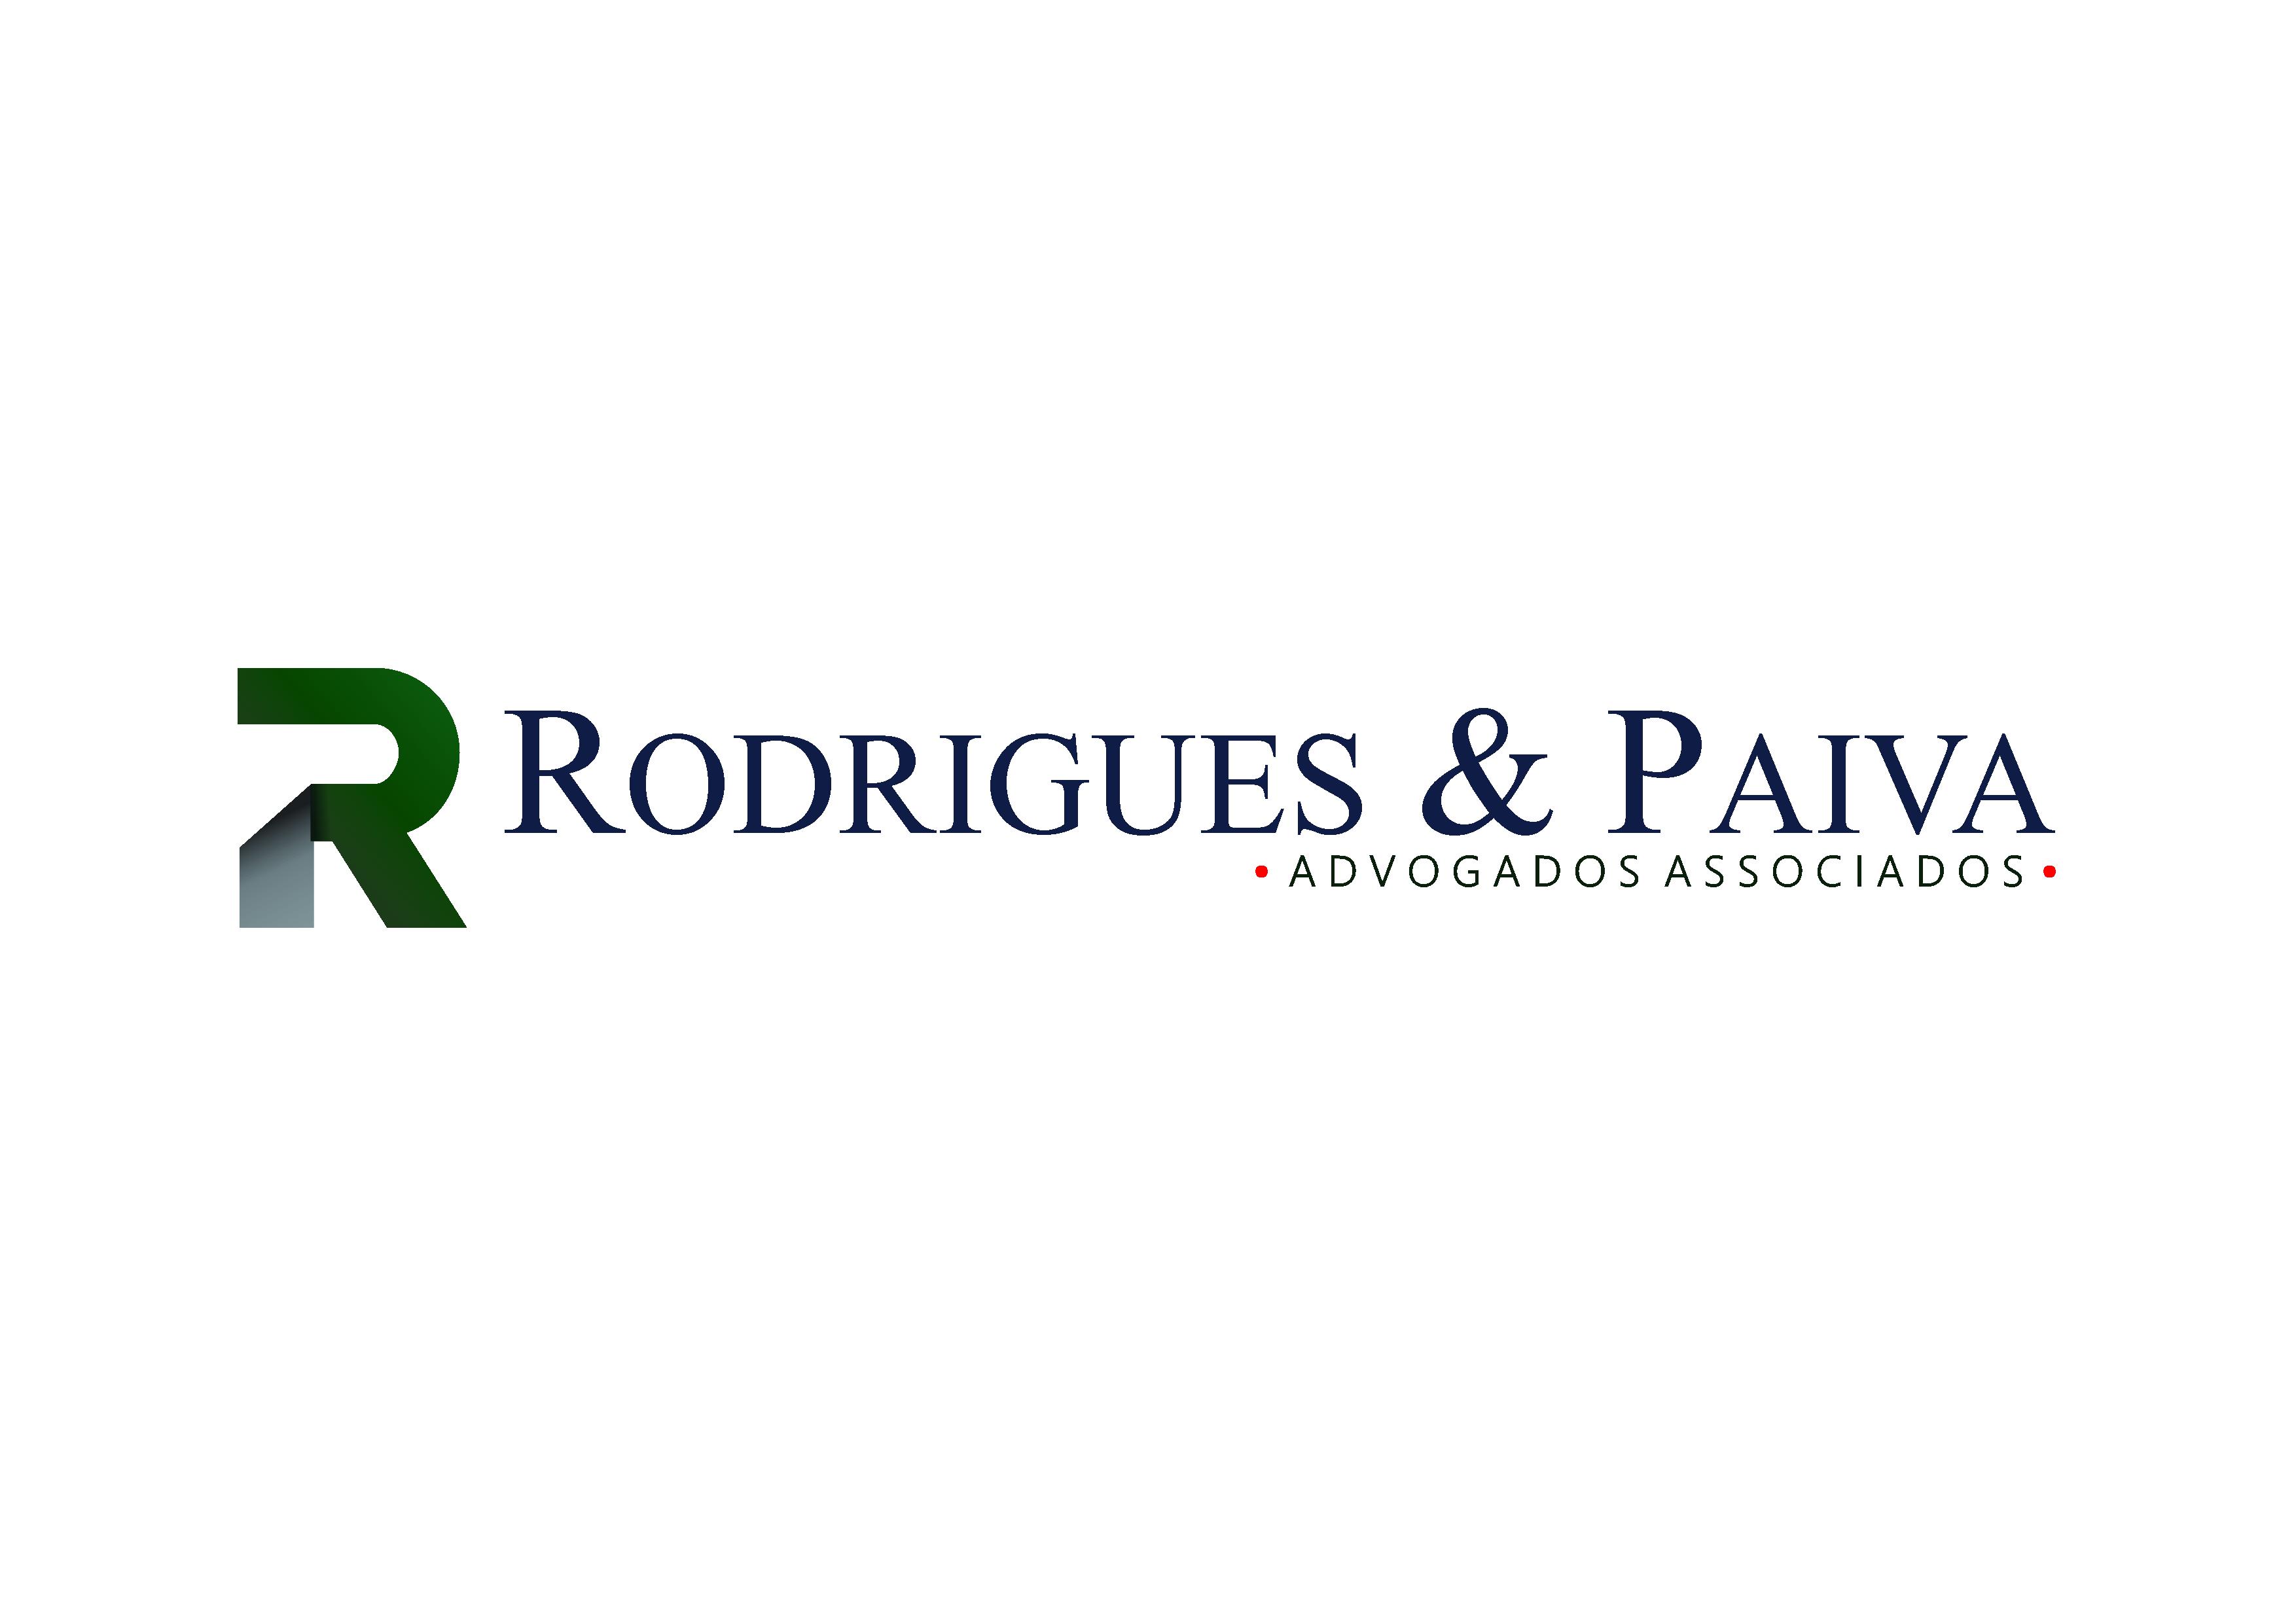 Logo-Rodrigues-Paiva-Aprovado